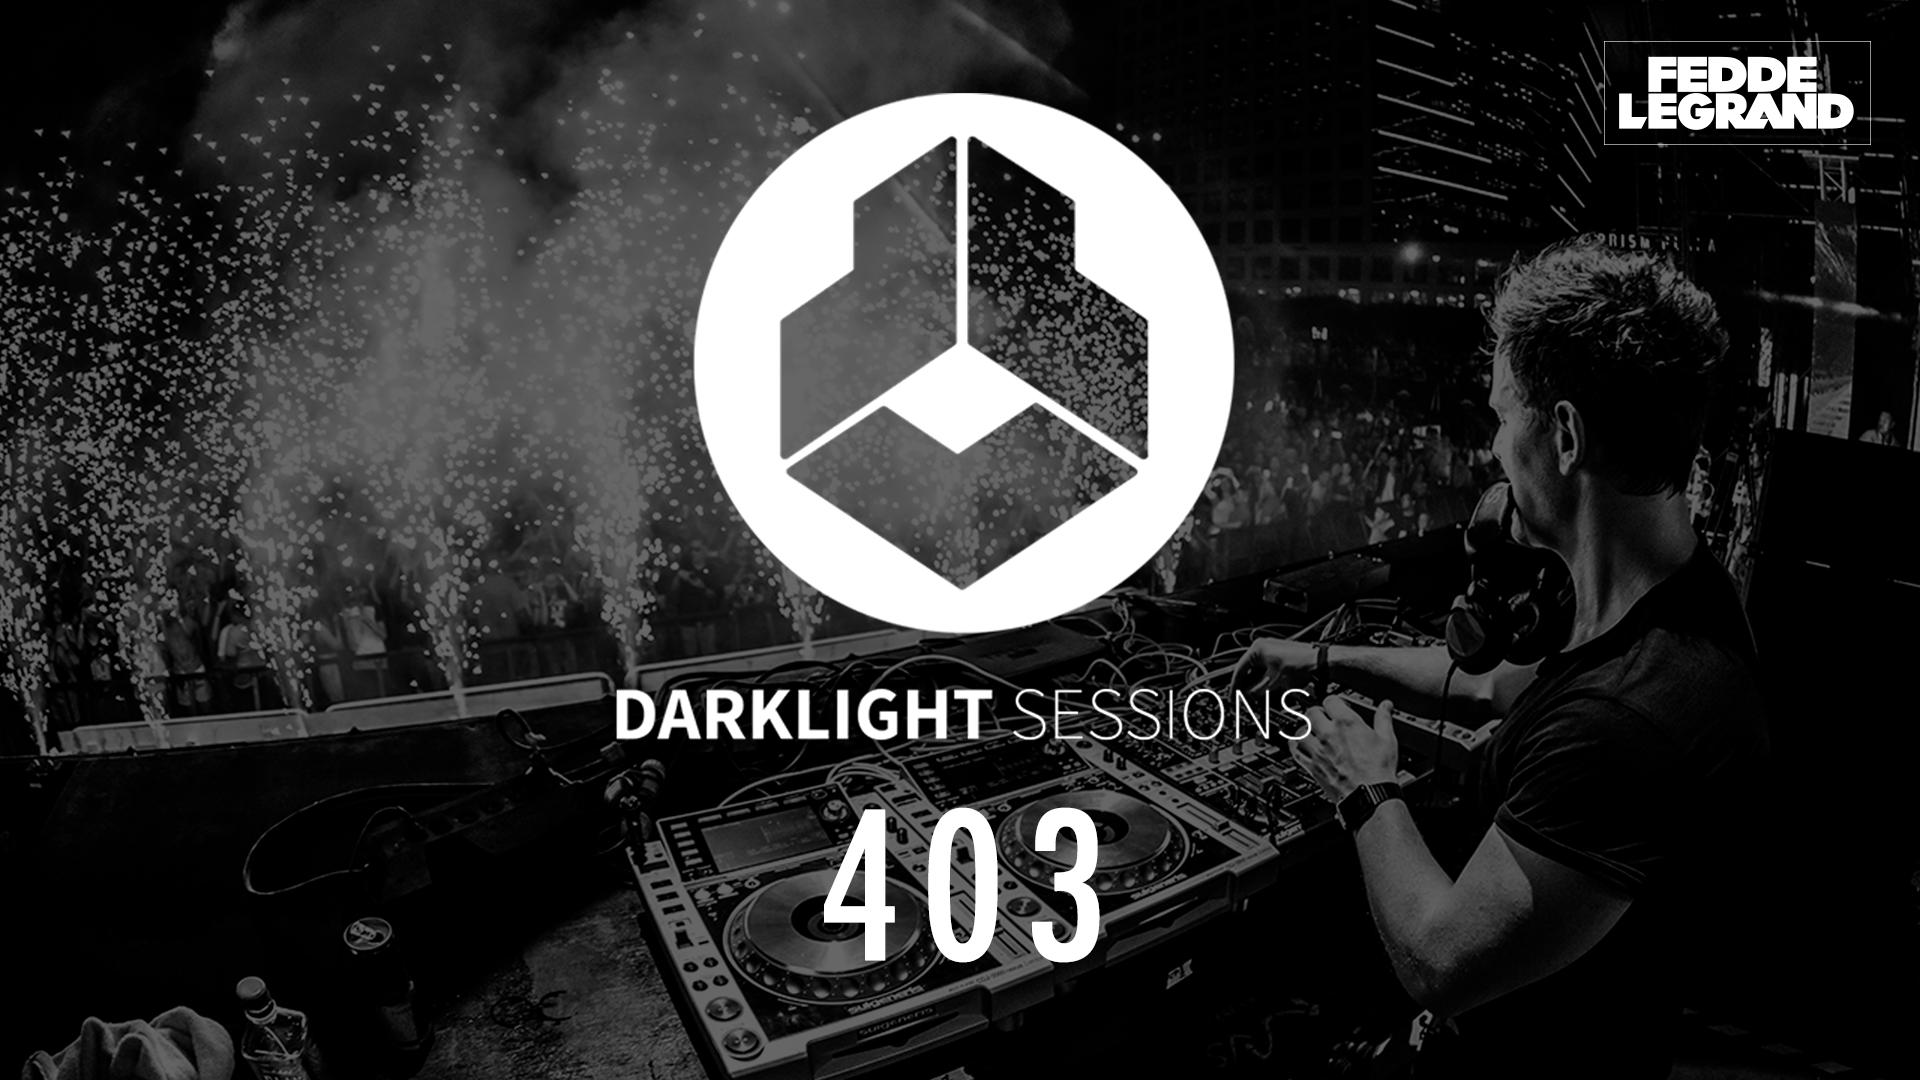 Darklight Sessions 403